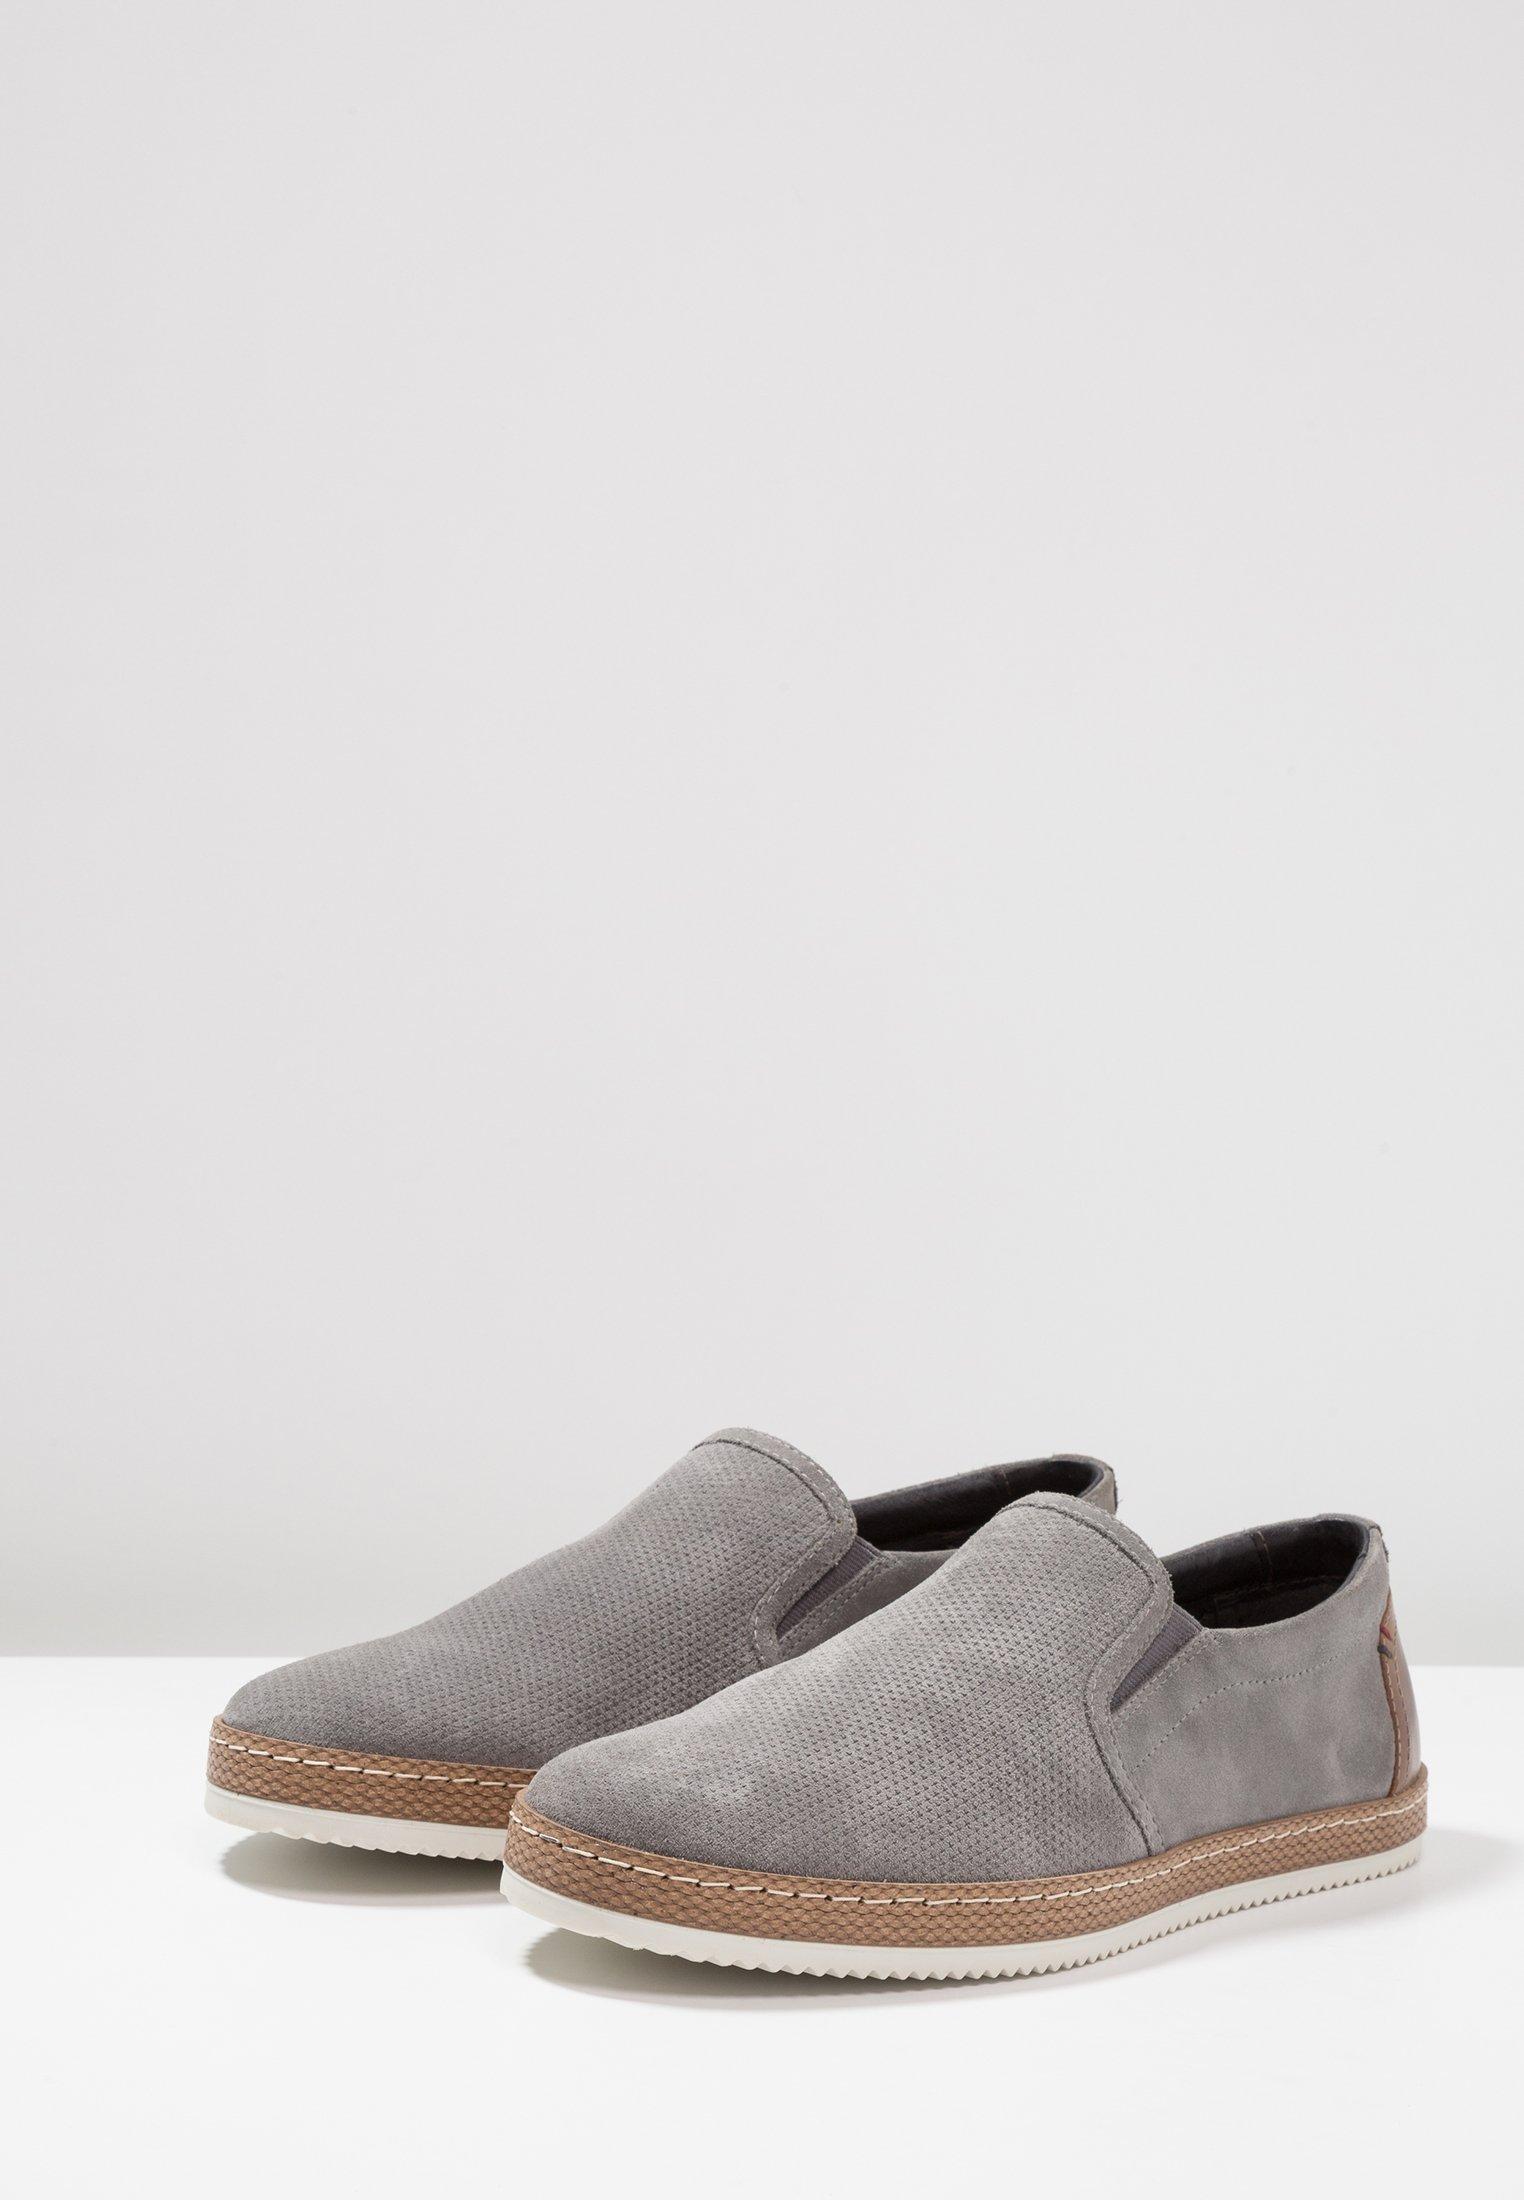 Pier One Slip-ins - grey